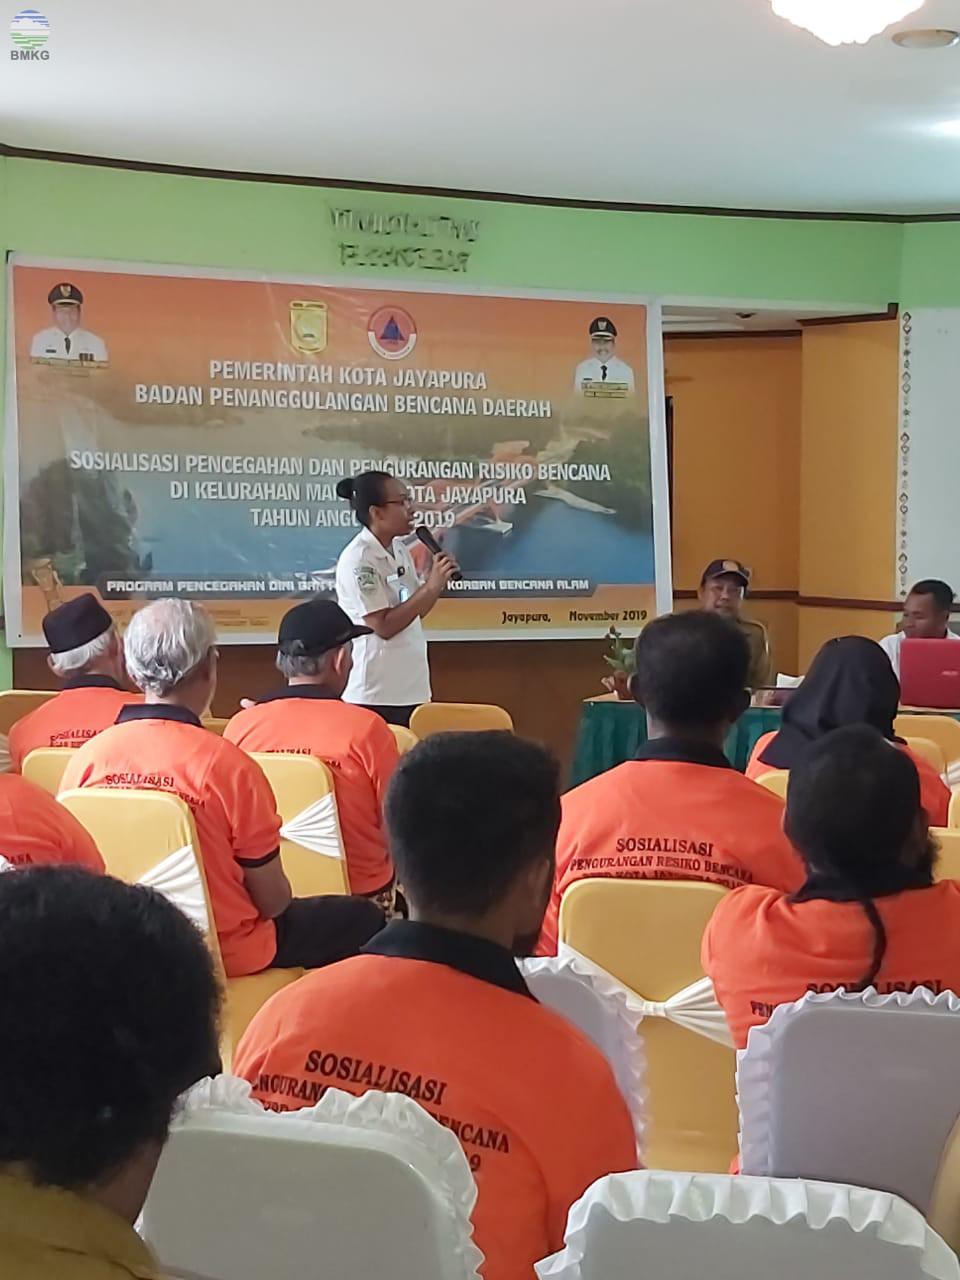 Sosialisasi Pencegahan dan Penanggulangan Resiko Bencana di Wilayah Kelurahan Mandala, Kota Jayapura